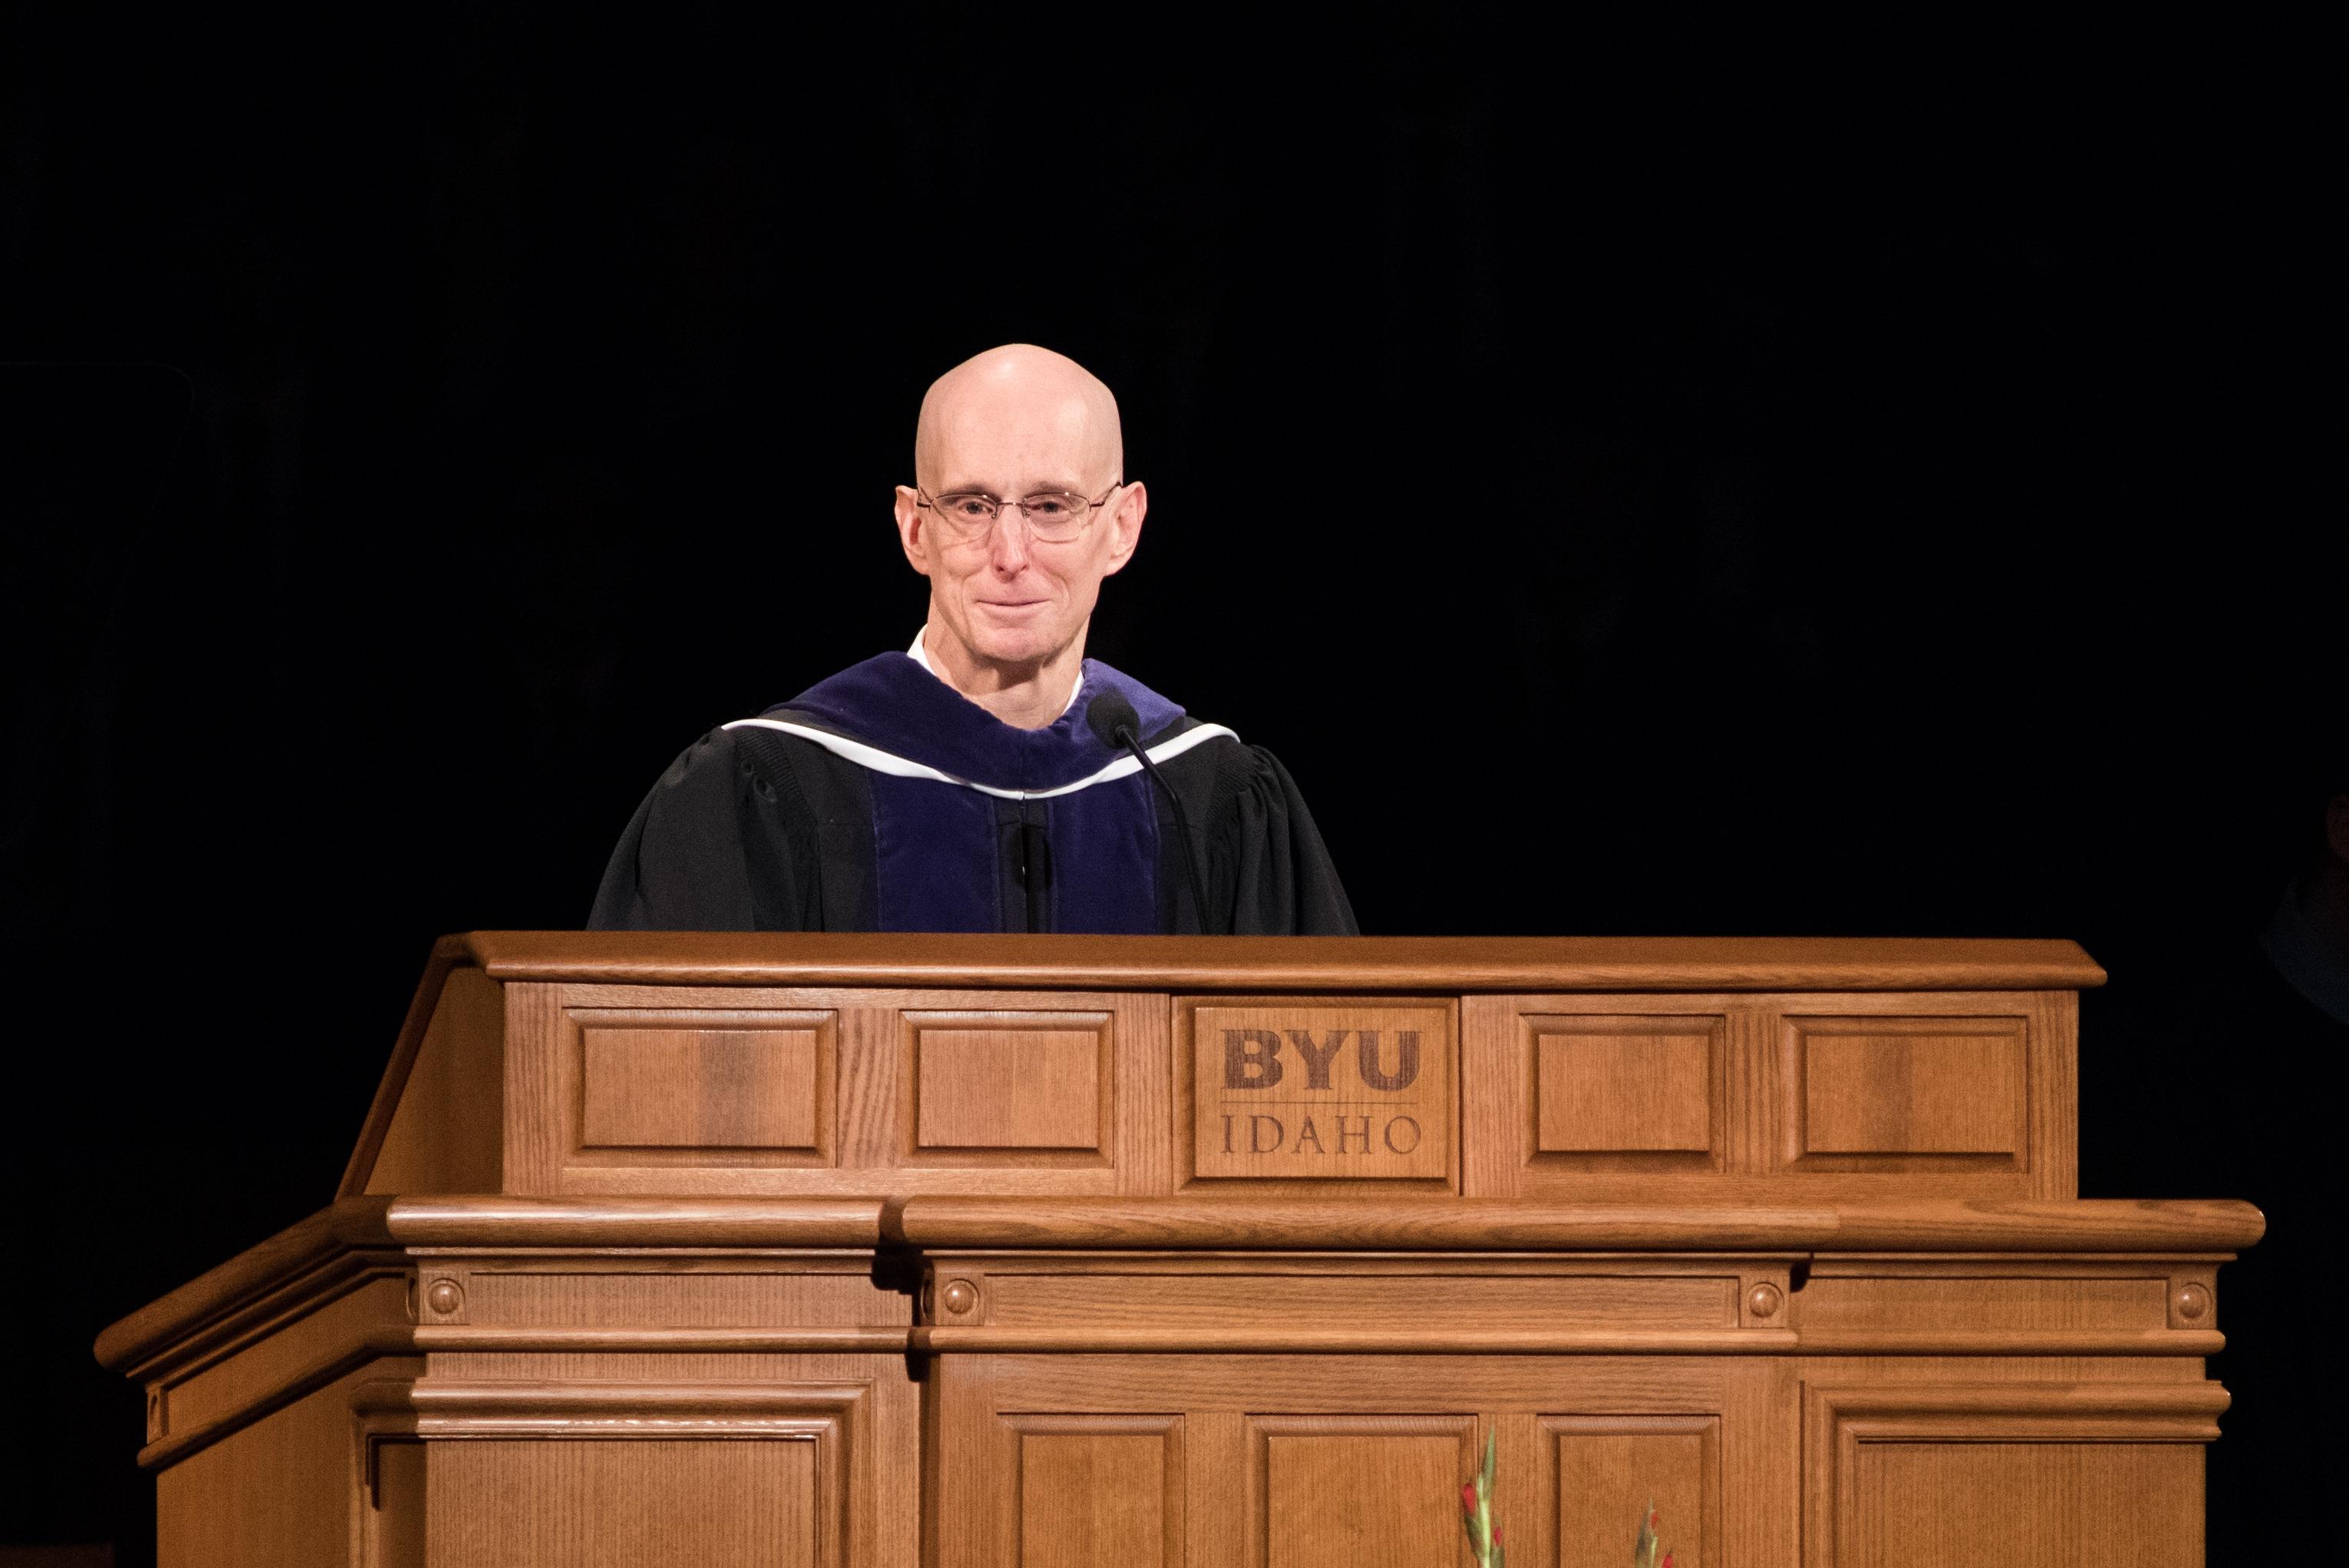 BYU-Idaho President Henry J. Eyring speaks during commencement exercises.